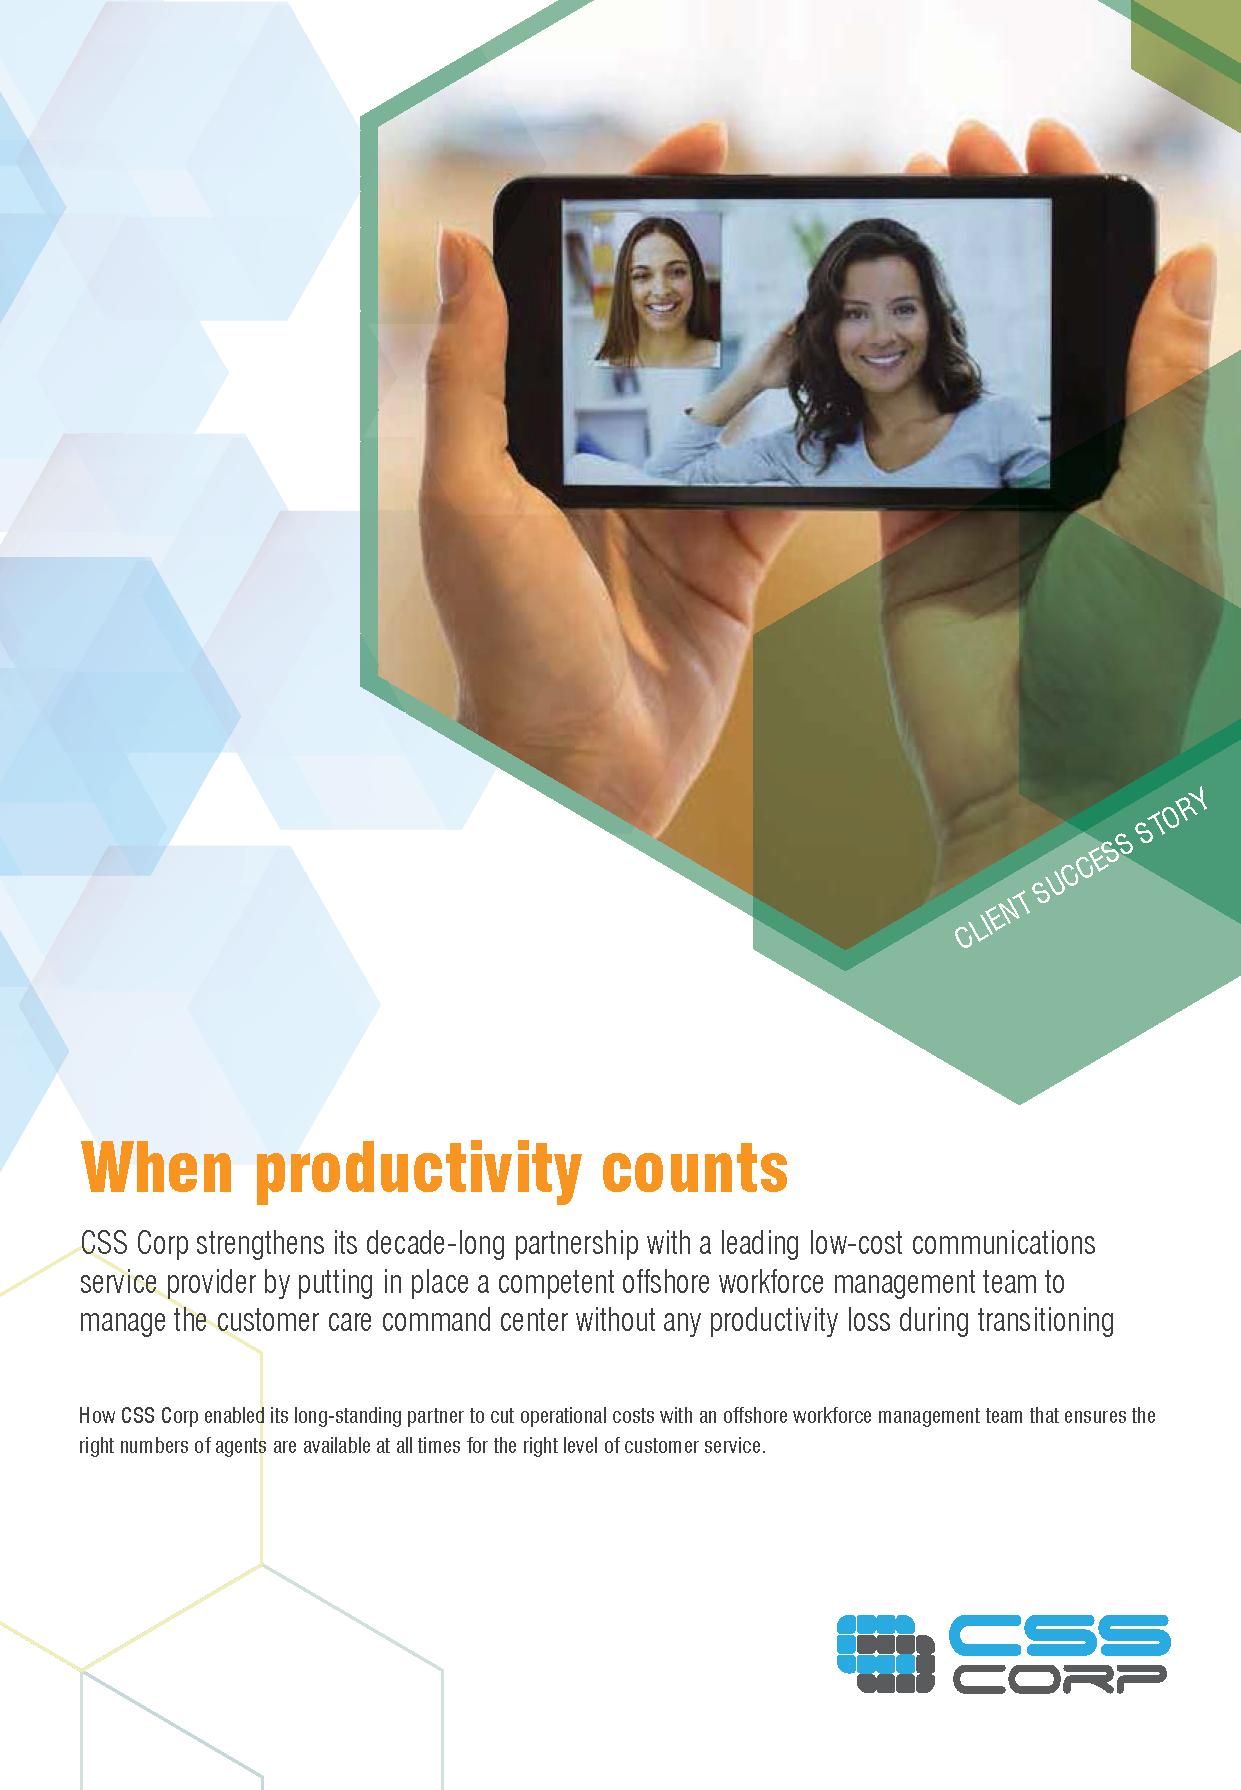 When productivity counts